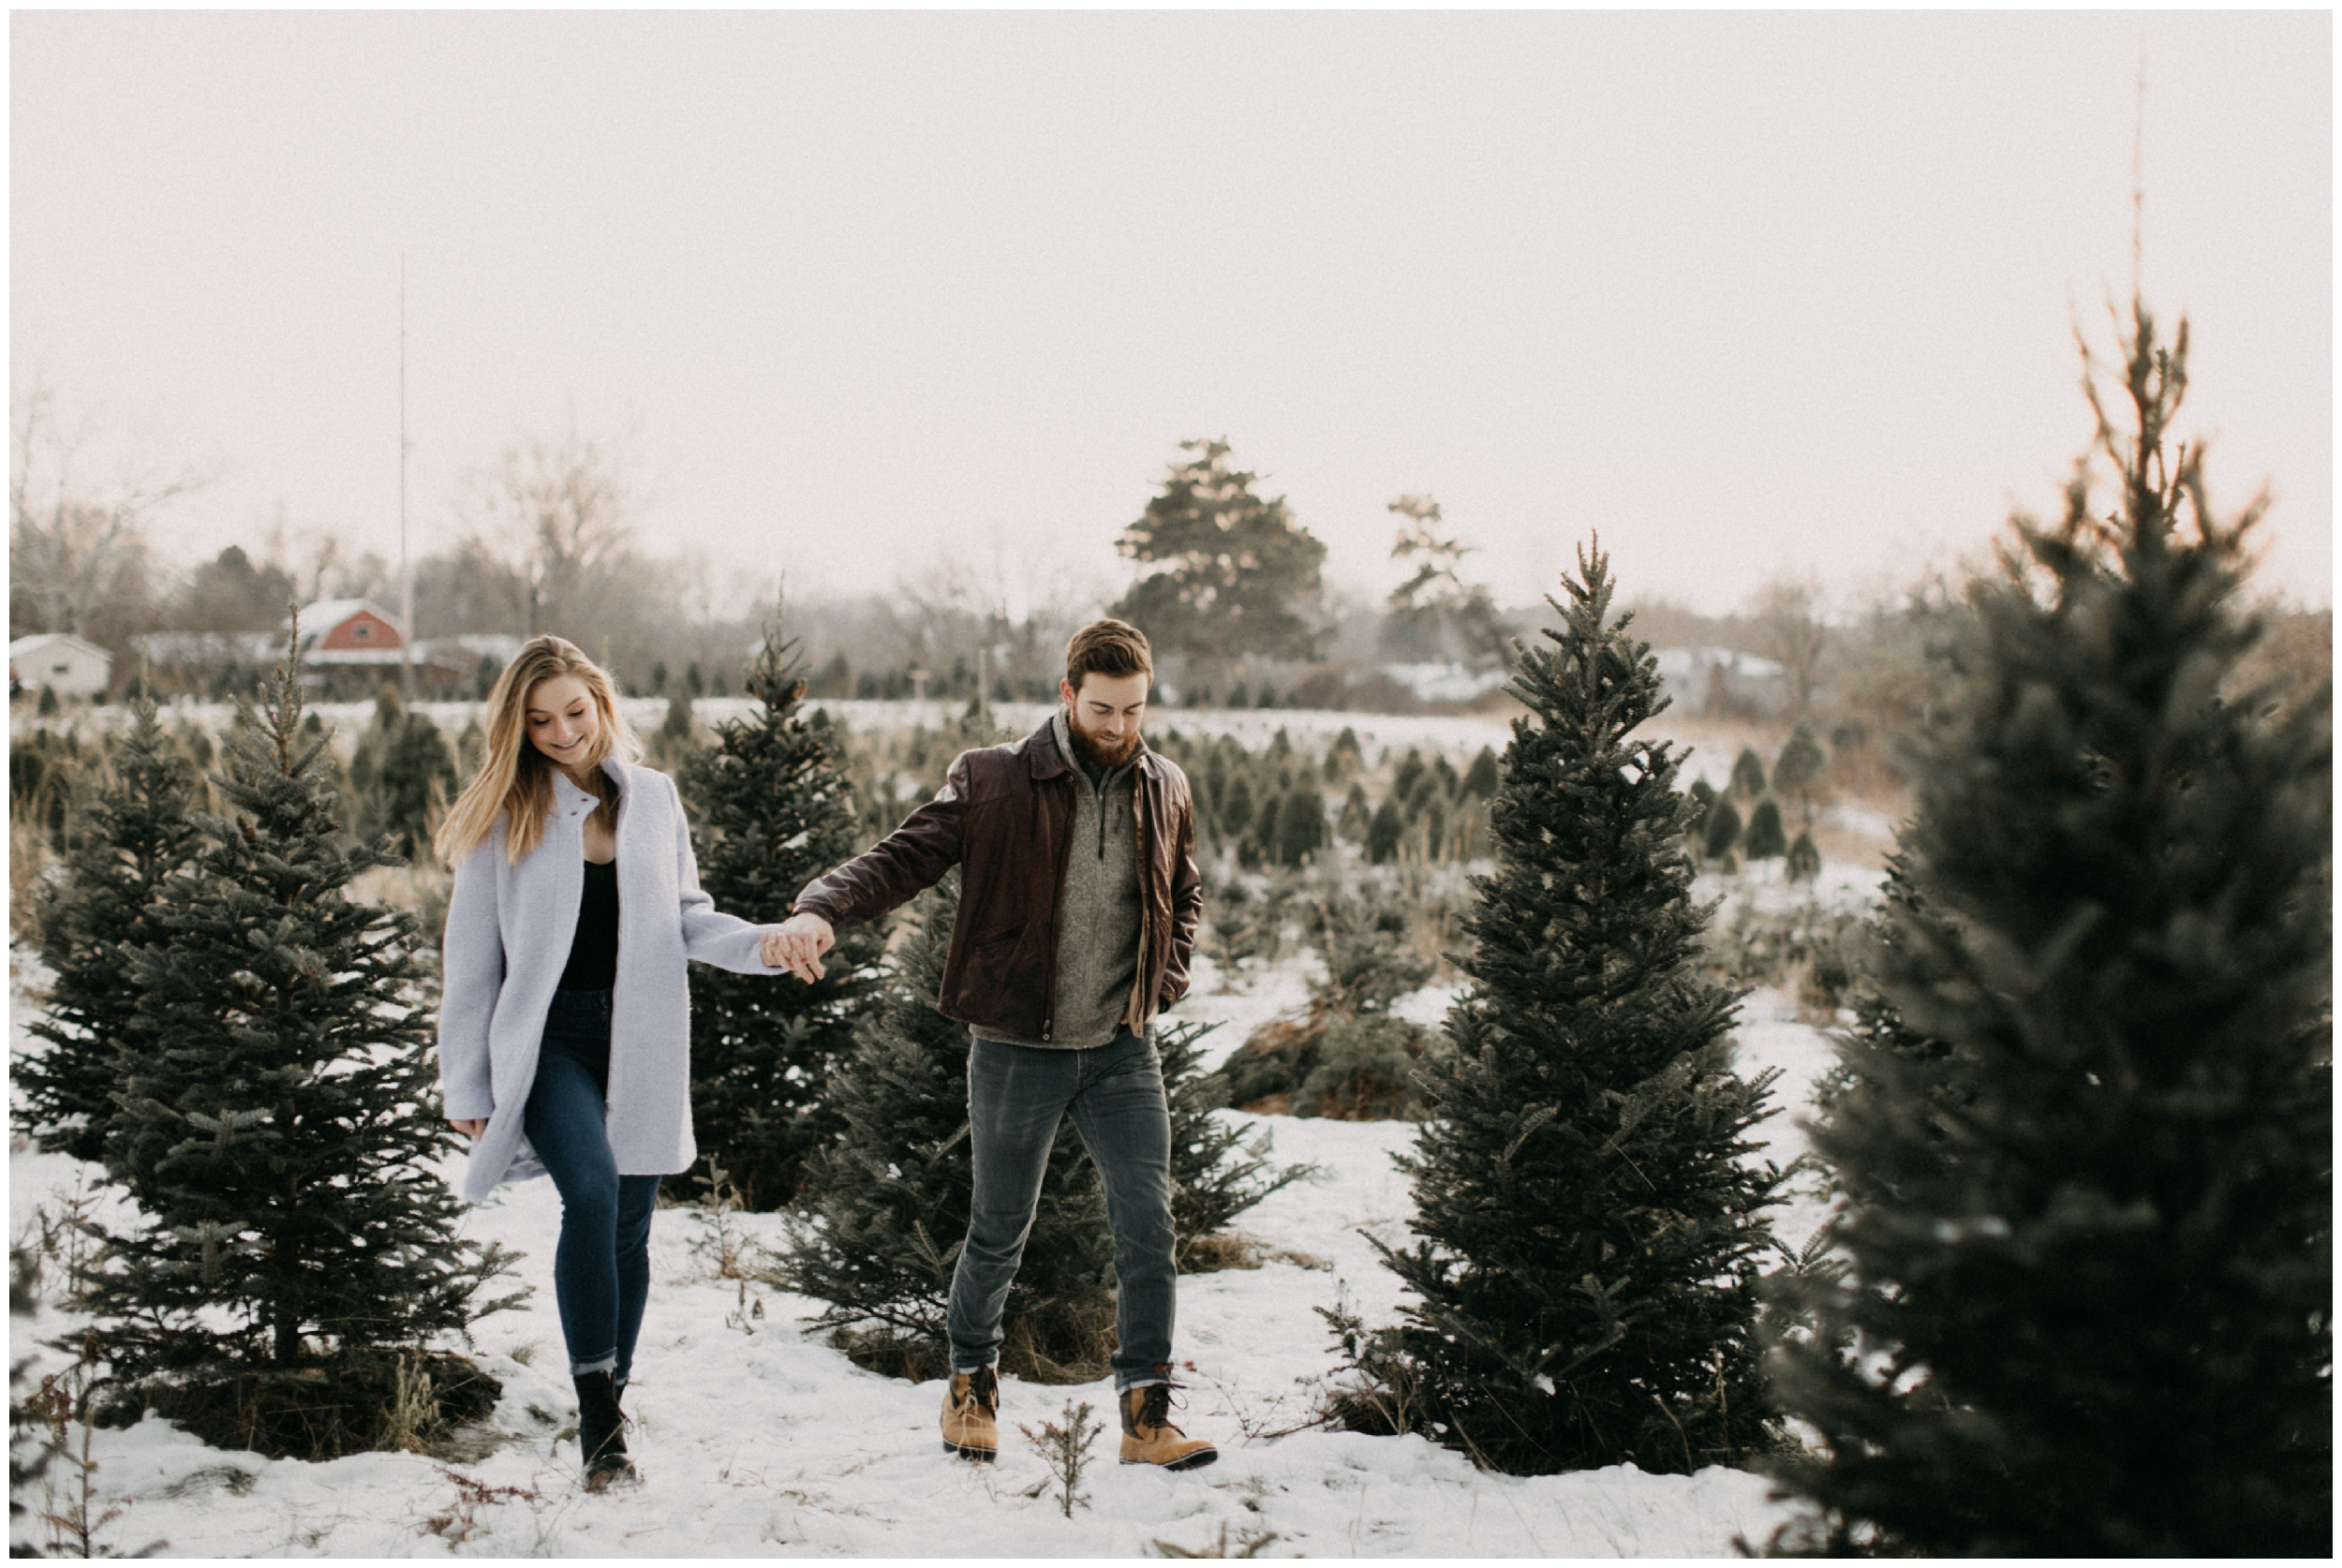 Christmas Tree farm engagement session by Minnesota wedding photographer Britt DeZeeuw